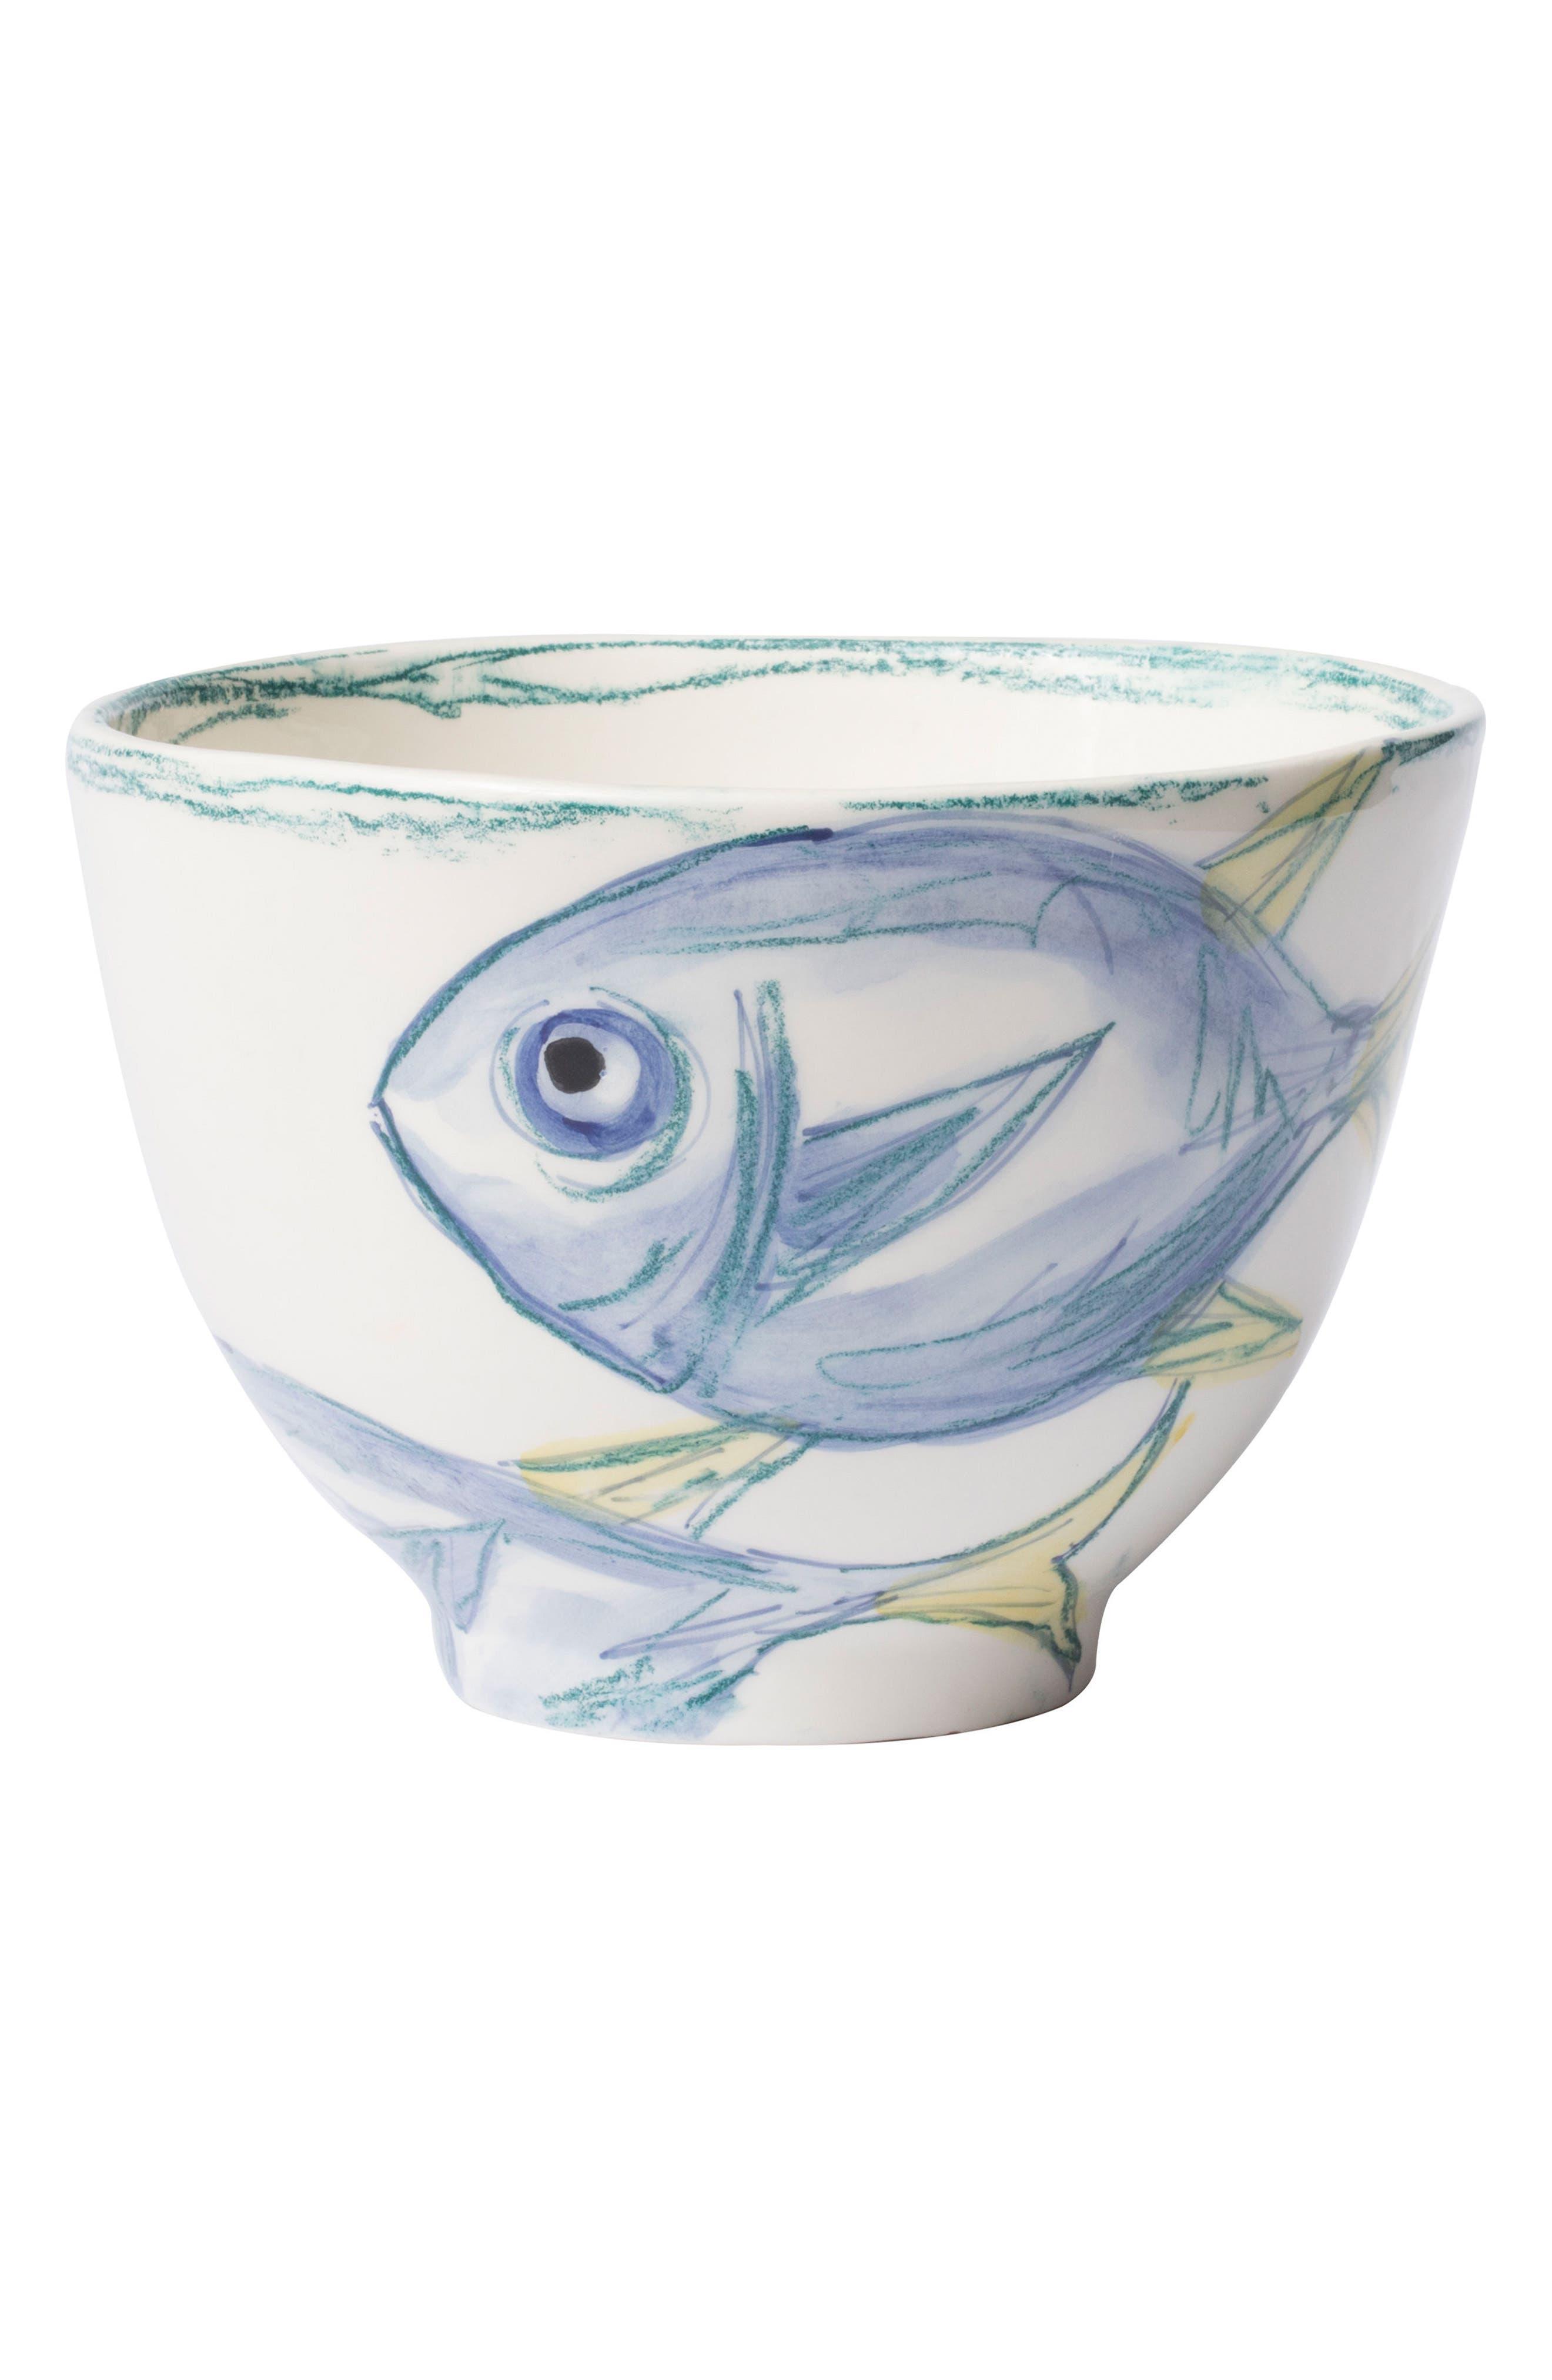 Pescatore Deep Serving Bowl,                             Main thumbnail 1, color,                             White